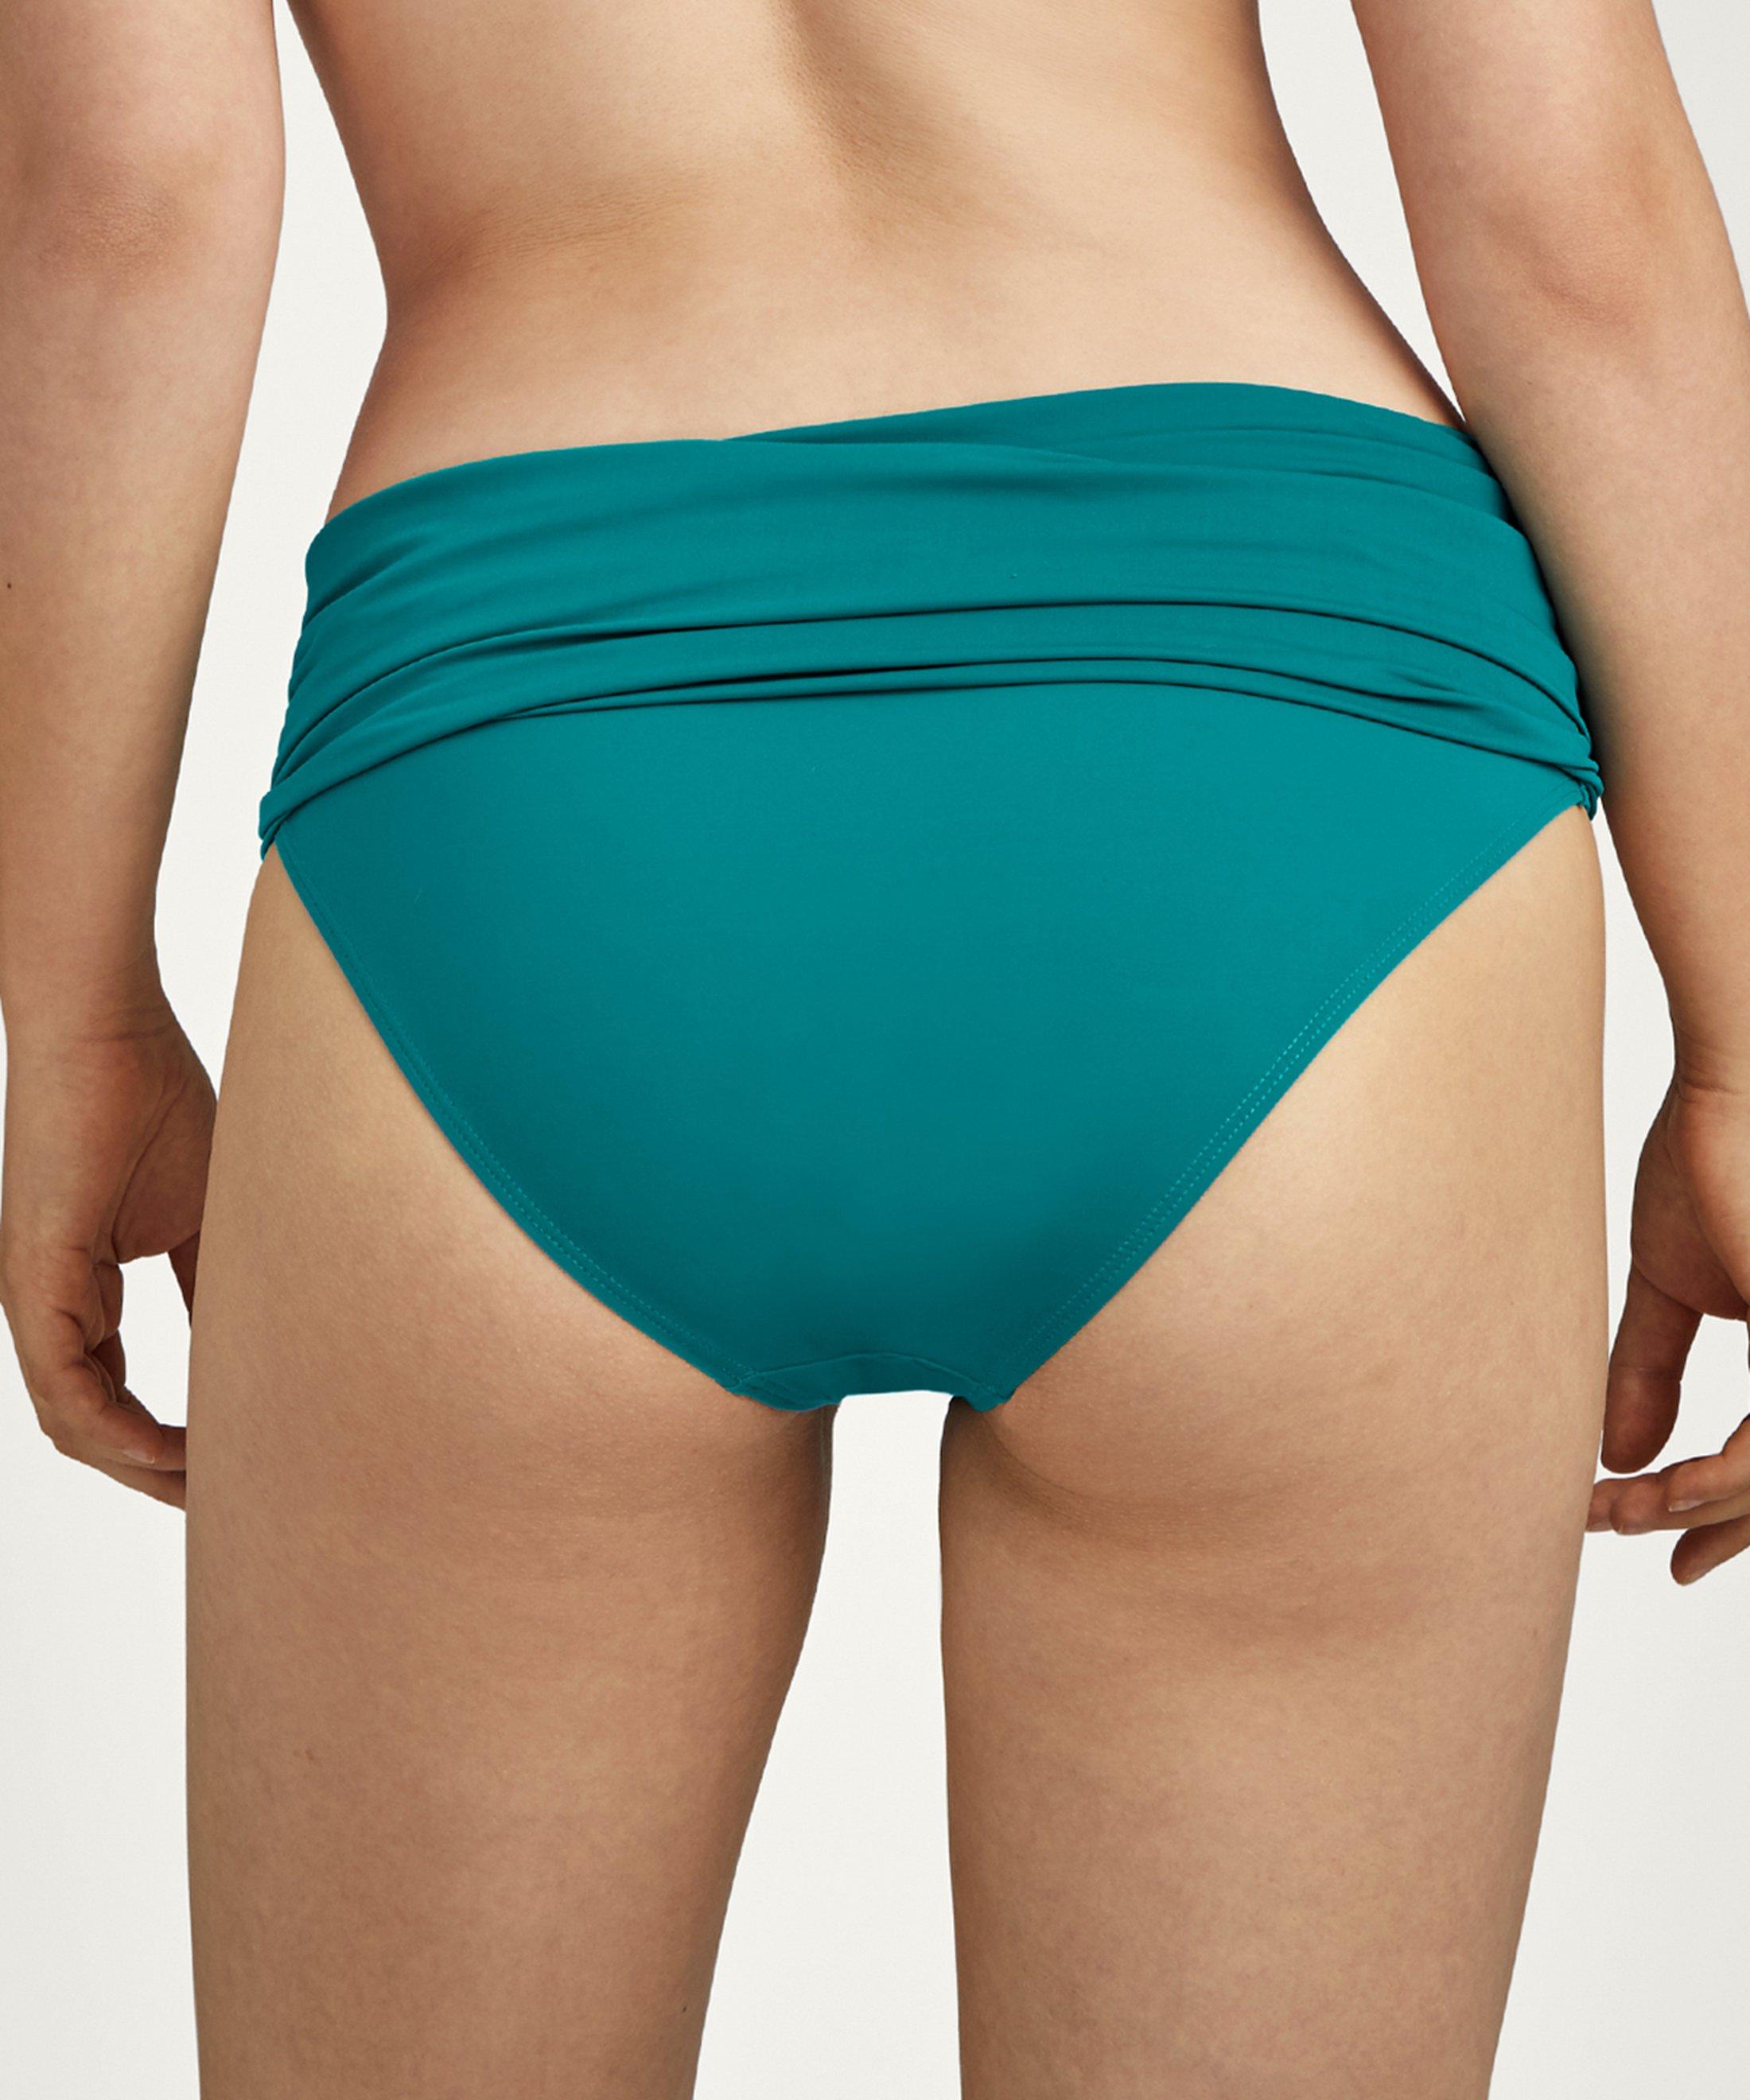 LA PLAGE ENSOLEILLÉE Brazilian bikini bottom Mineral Green | Aubade